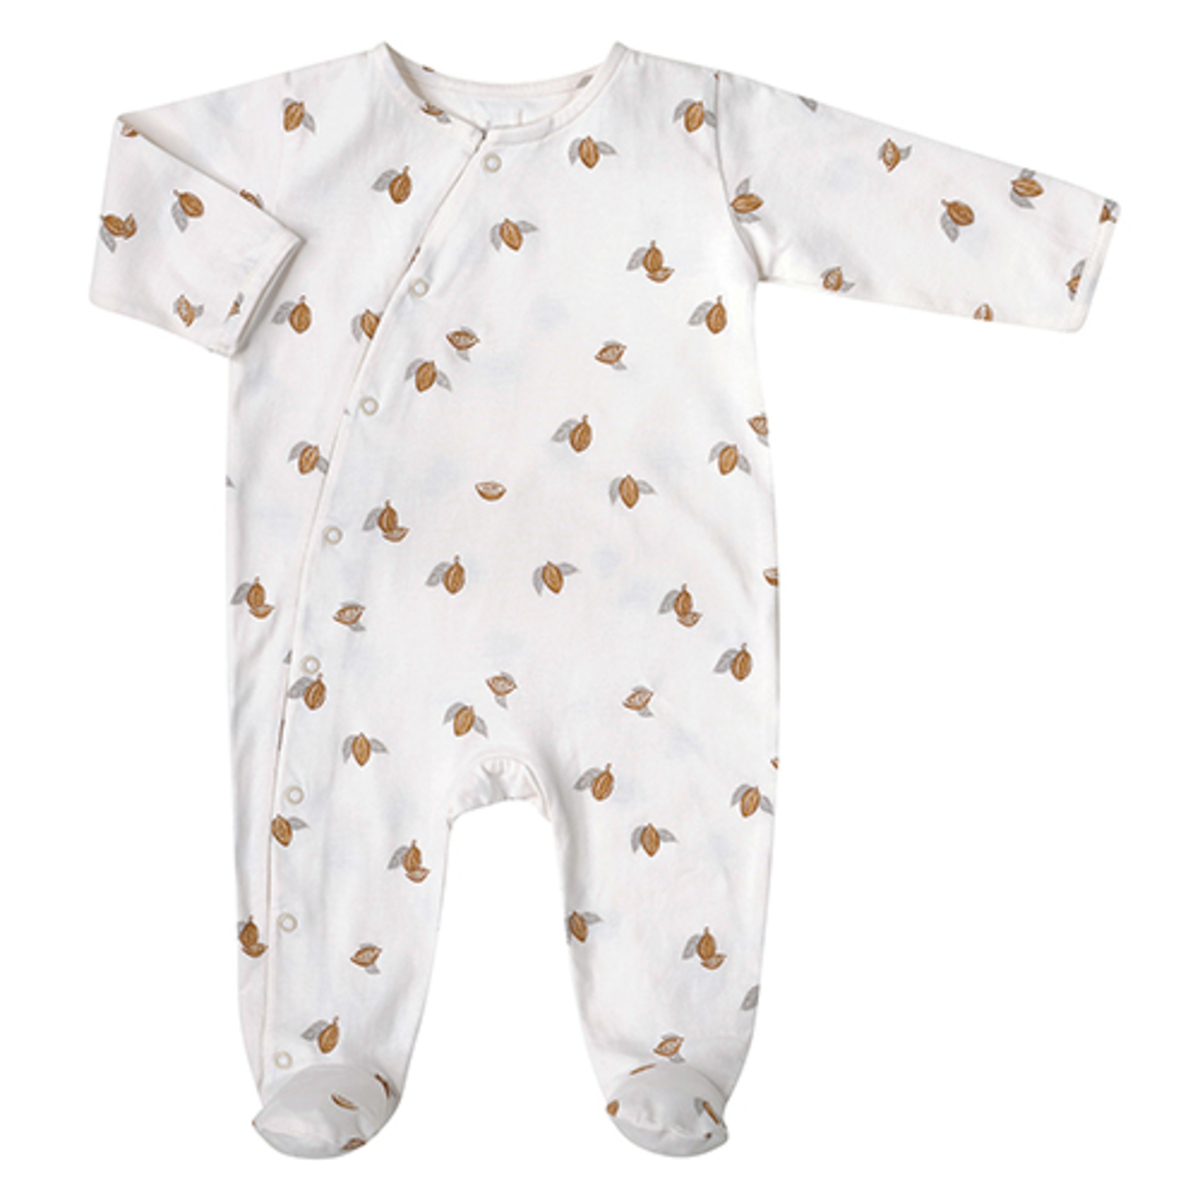 Body & Pyjama Combinaison Jour et Nuit Tonka - 3 Mois